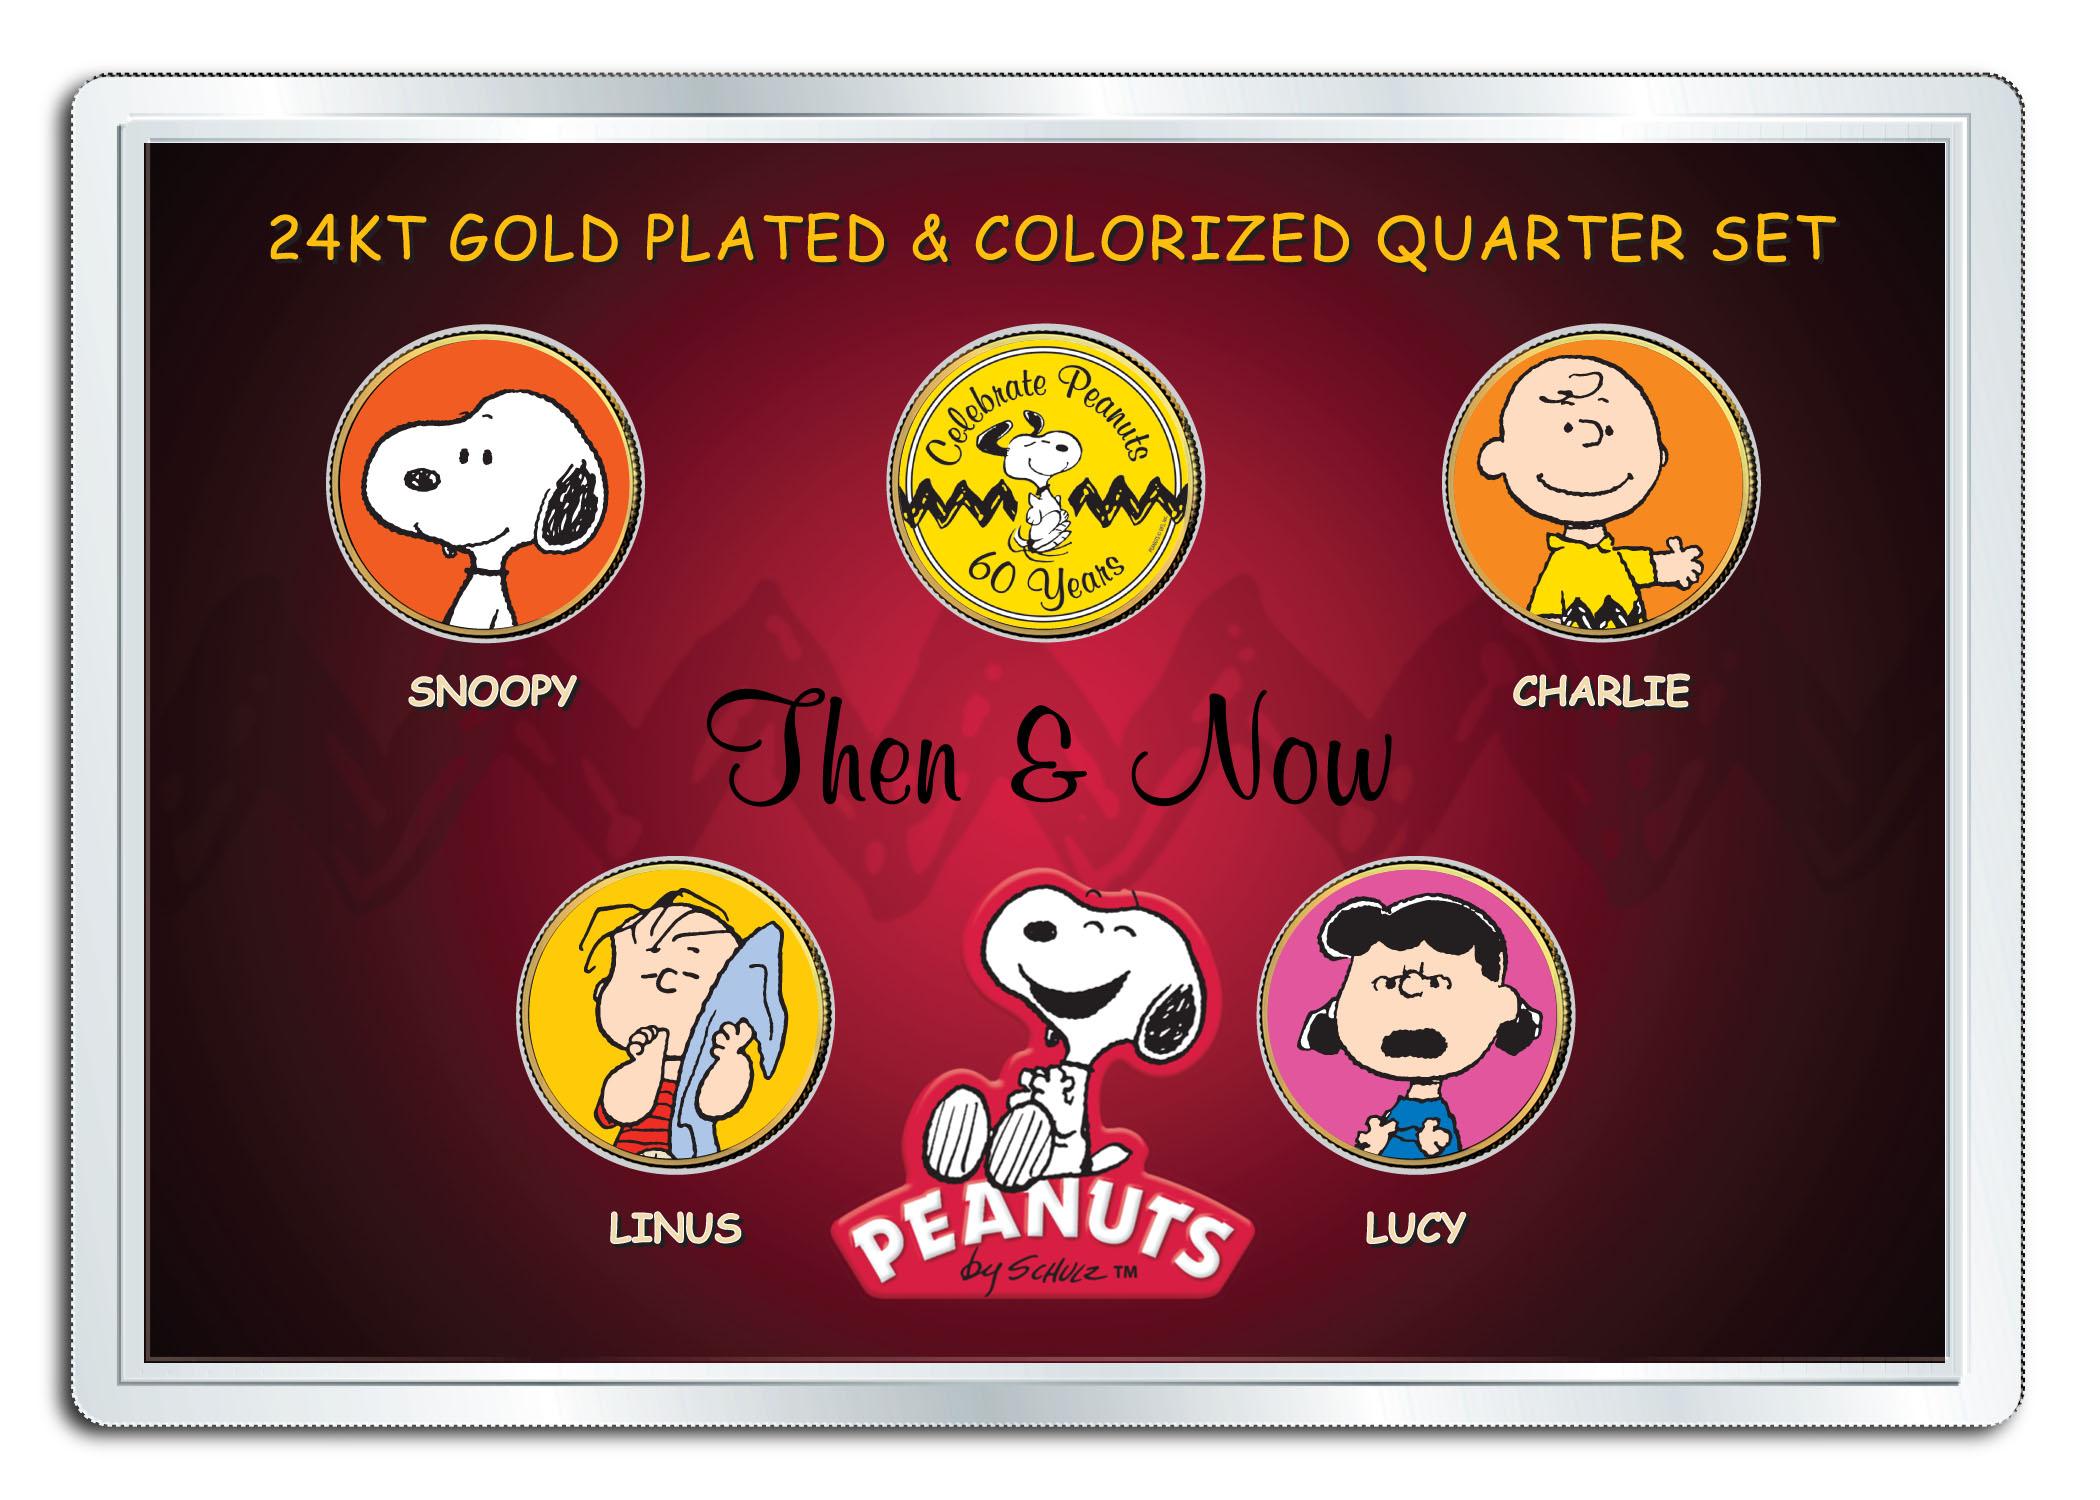 Americana CHARLIE BROWN Snoopy JFK Half Dollar Coin 24K Gold Plated PEANUTS